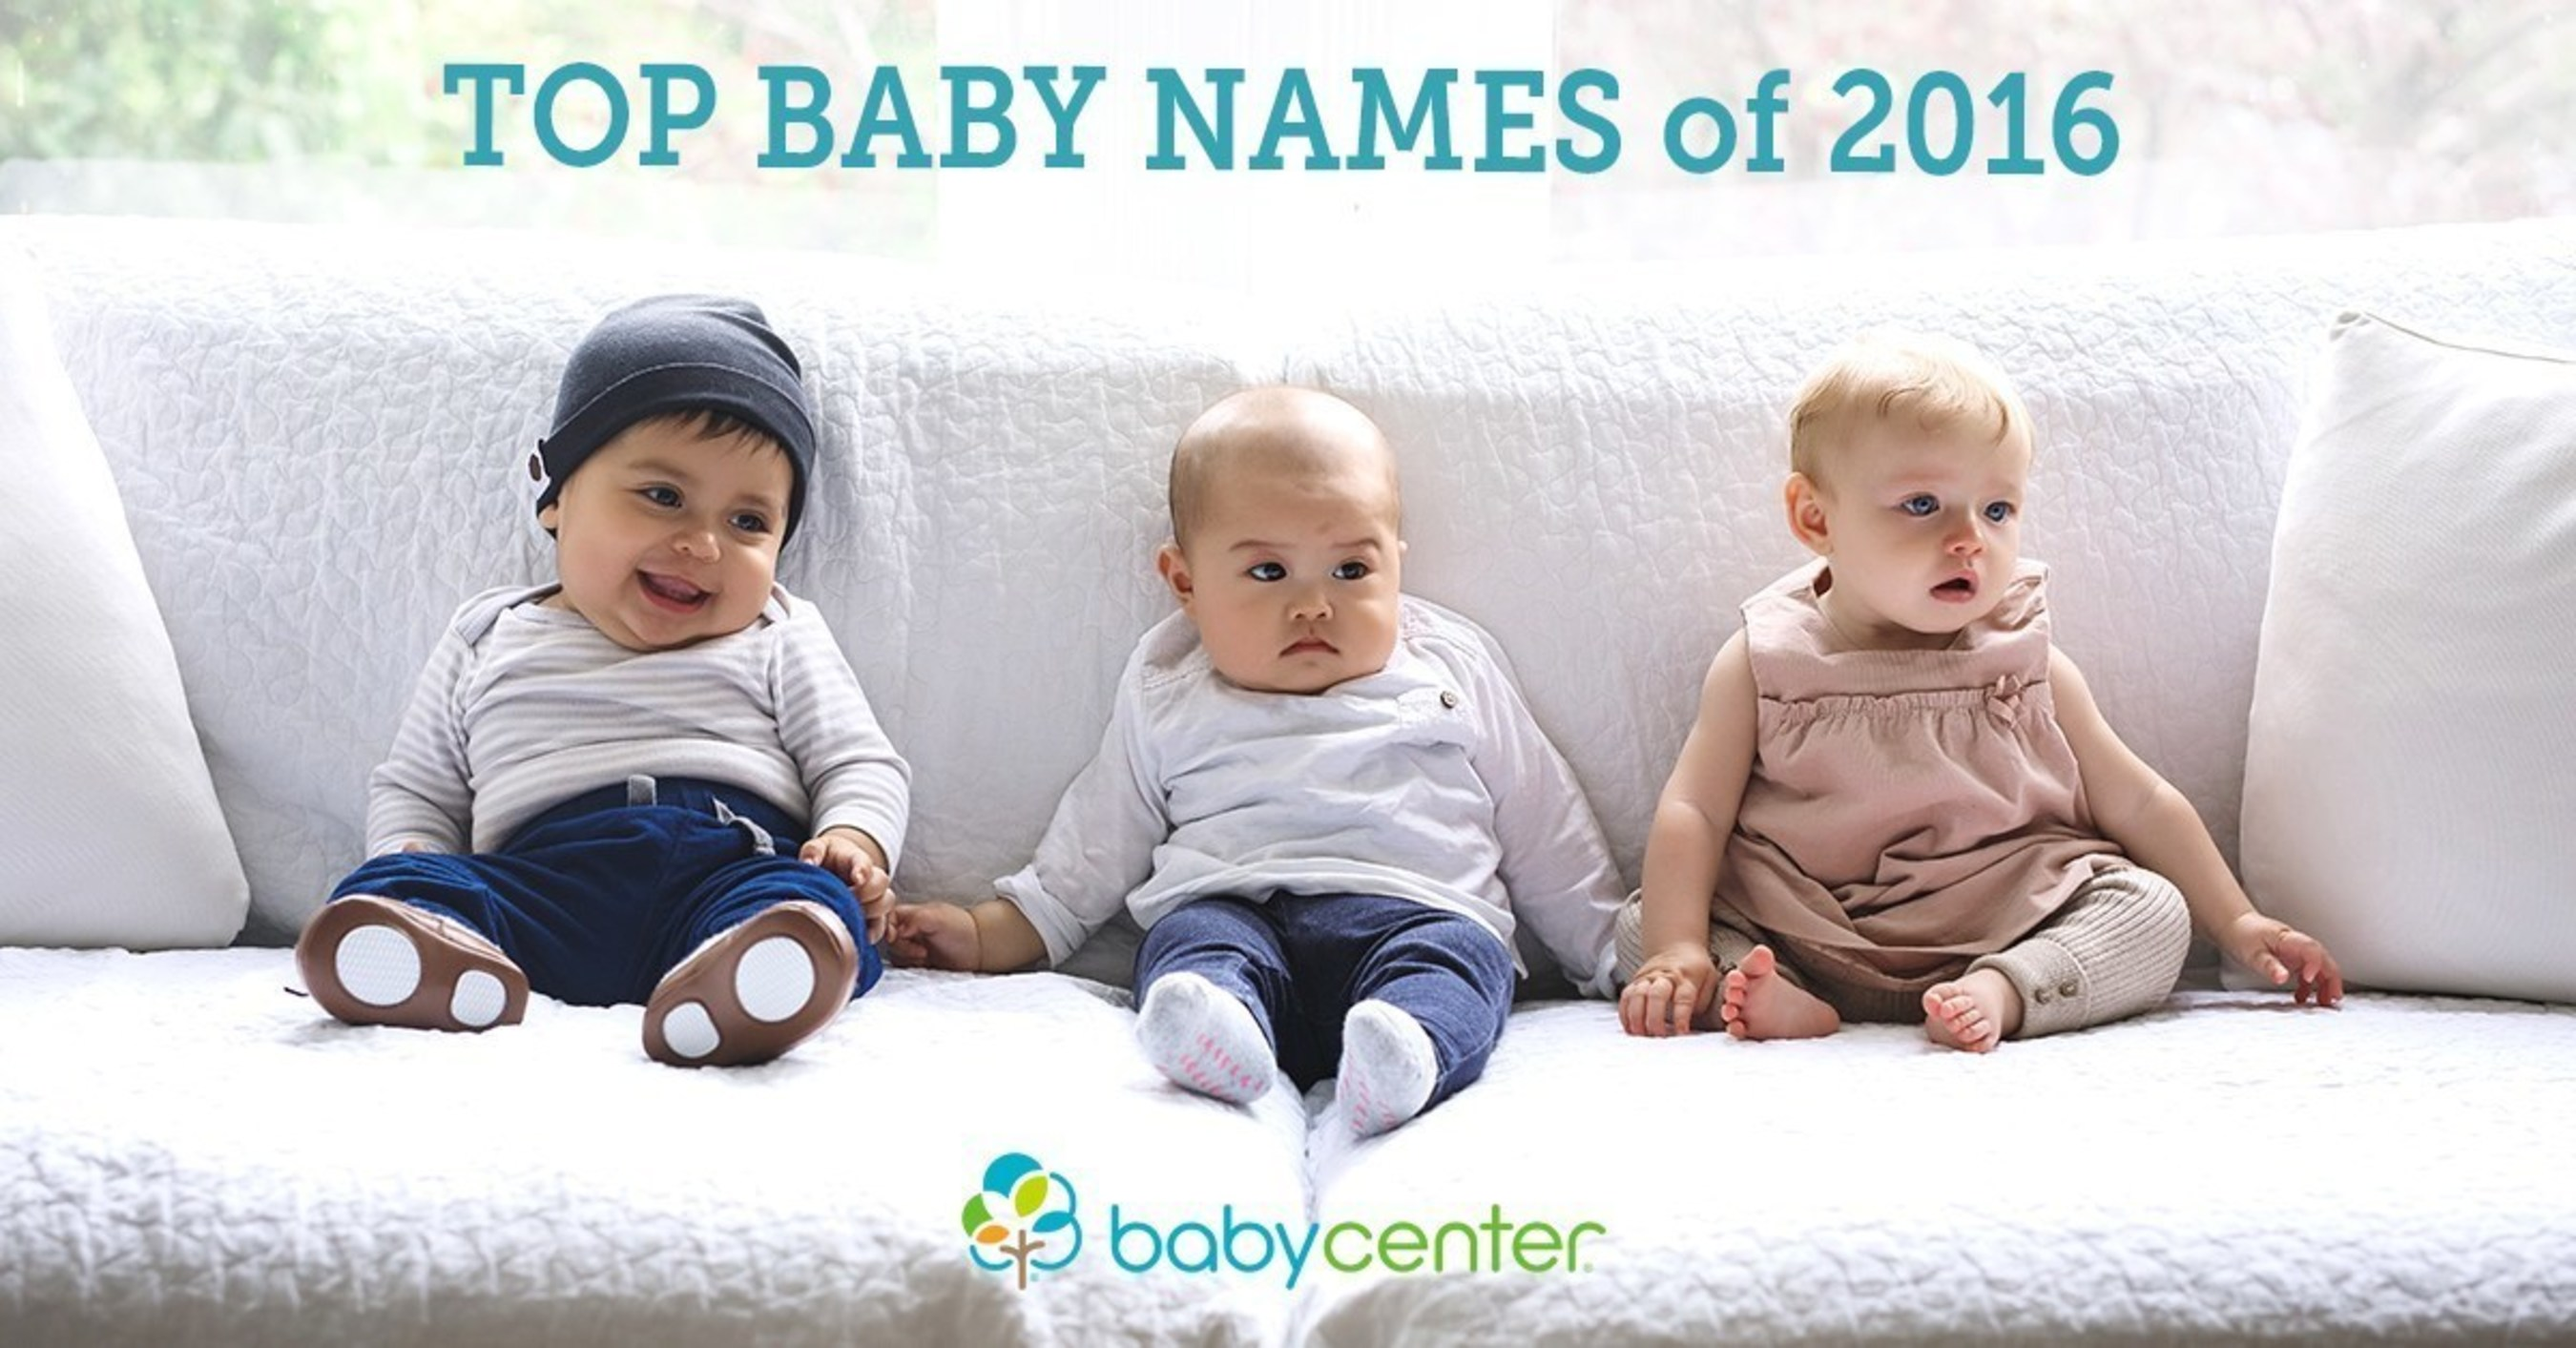 BabyCenter Top Baby Names of 2016